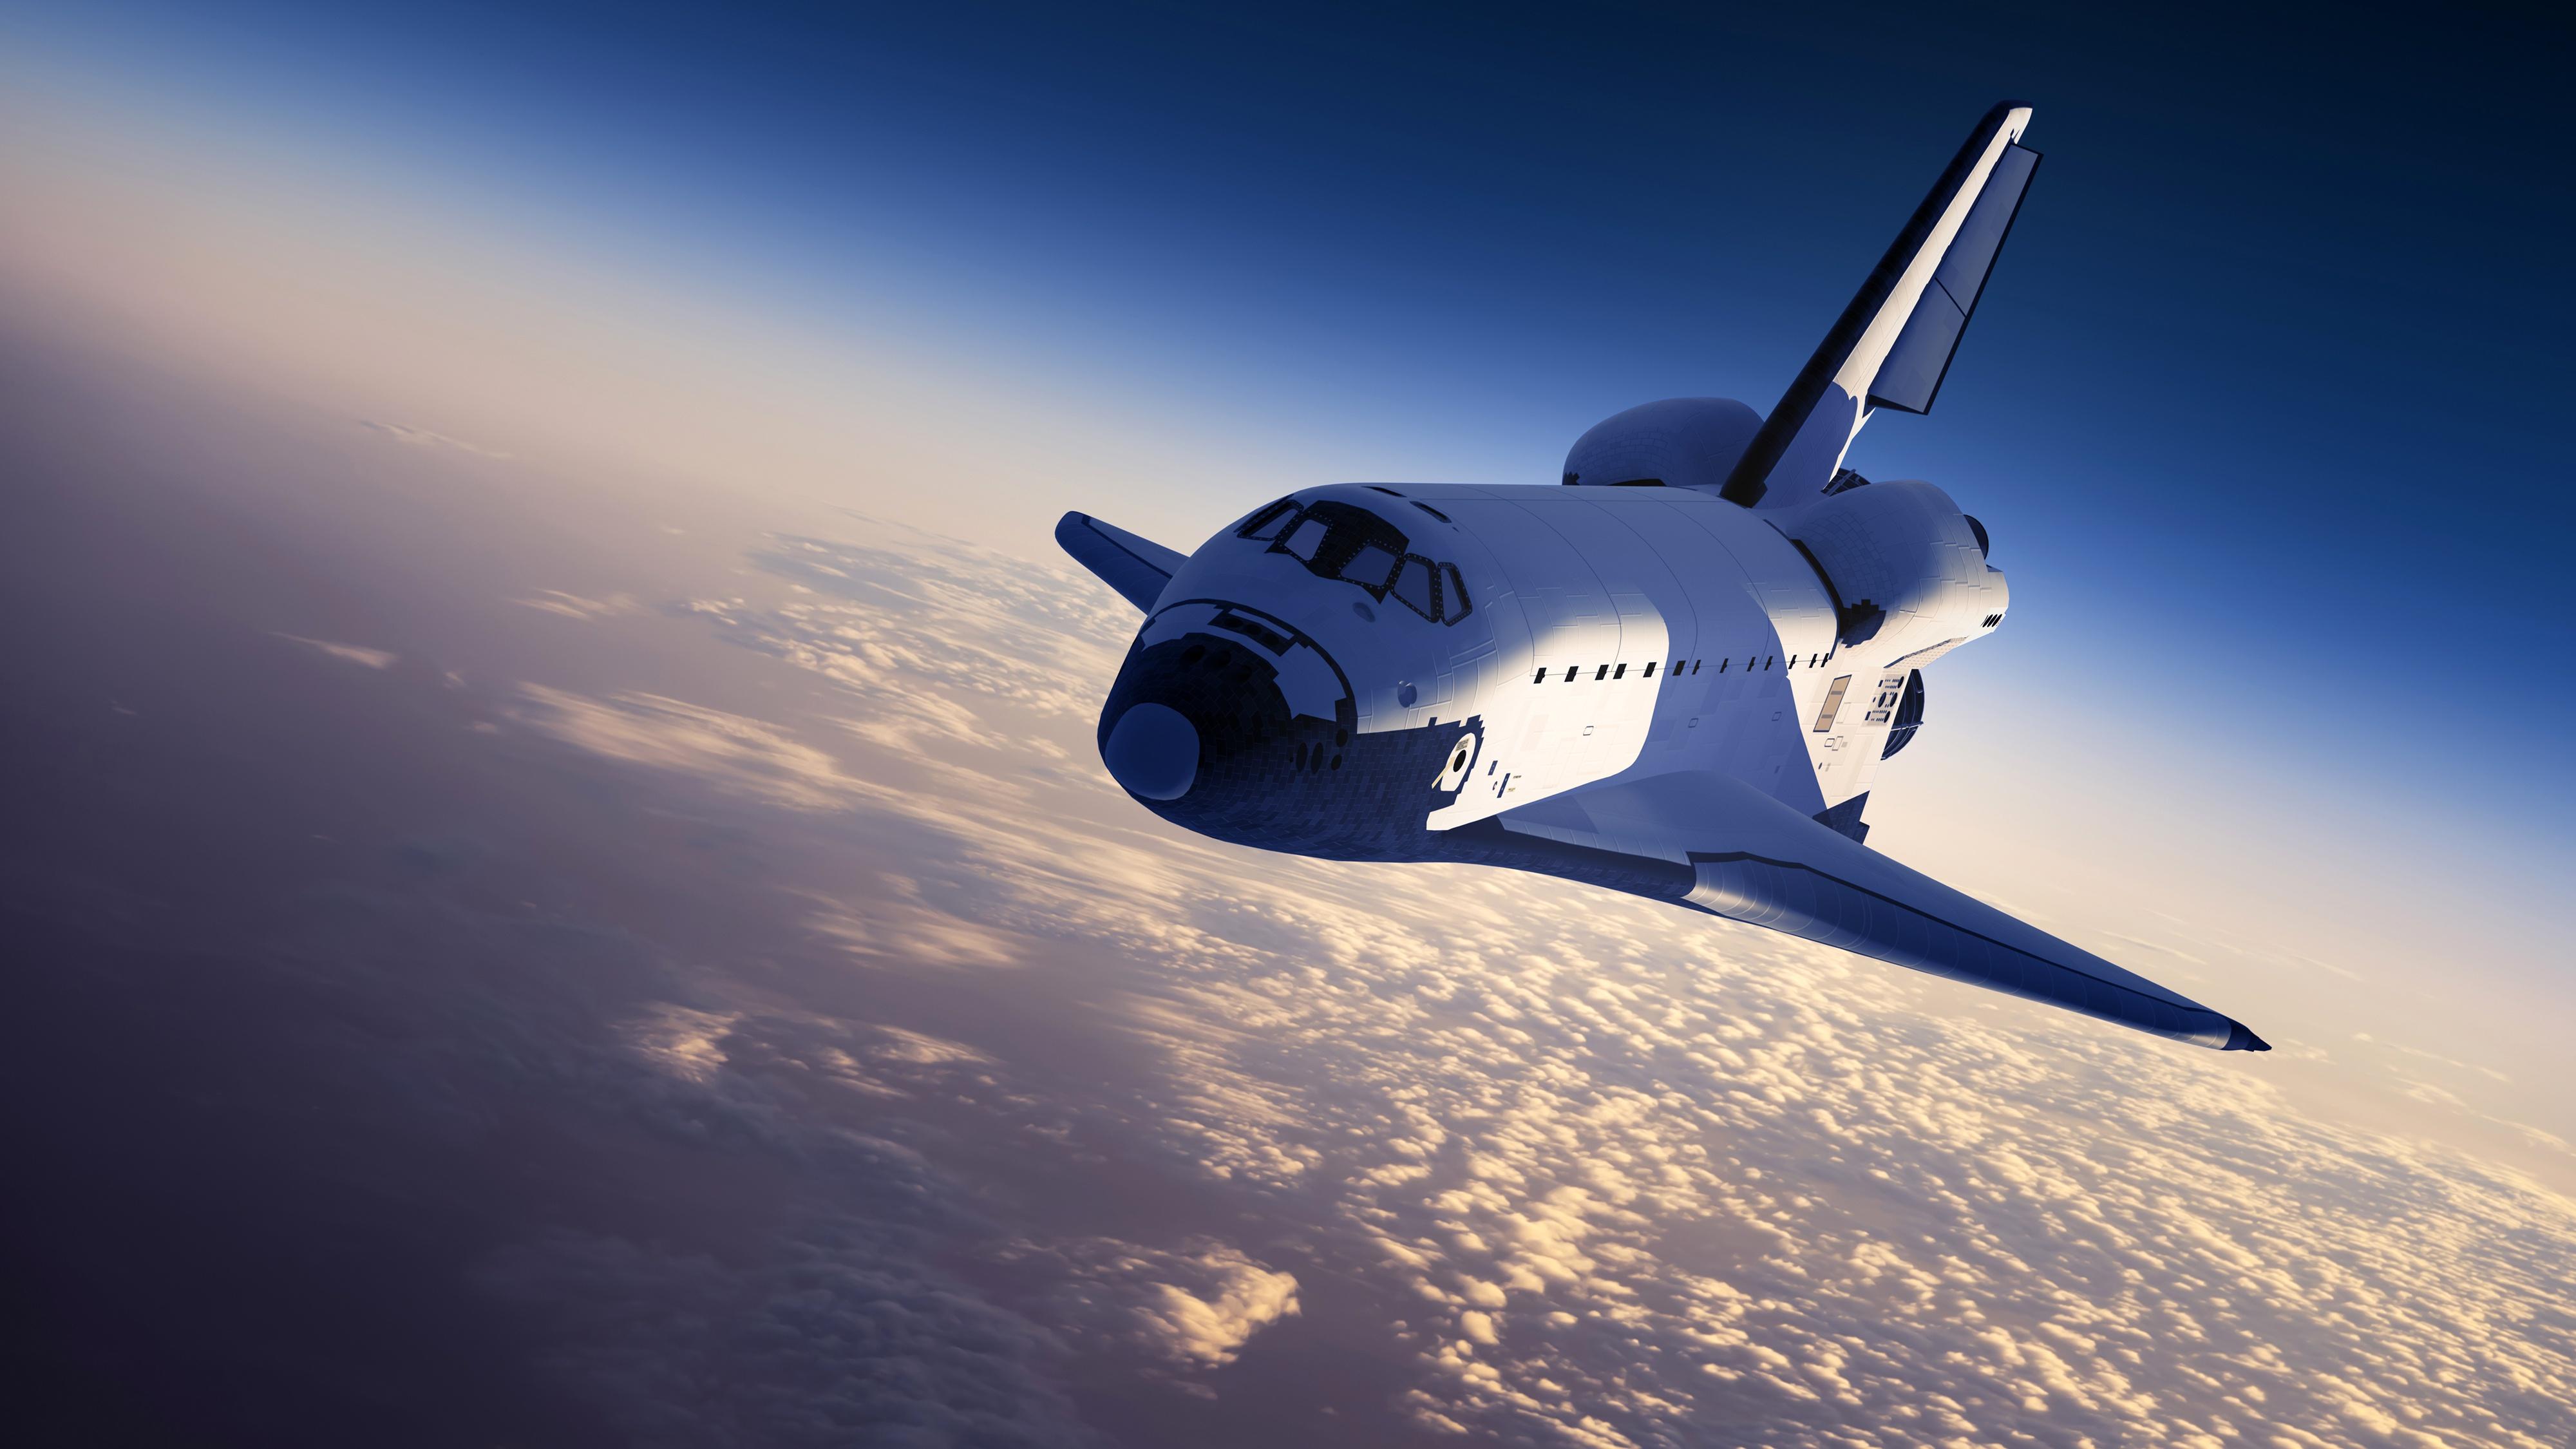 Cloud Space Space Shuttle 4000x2250